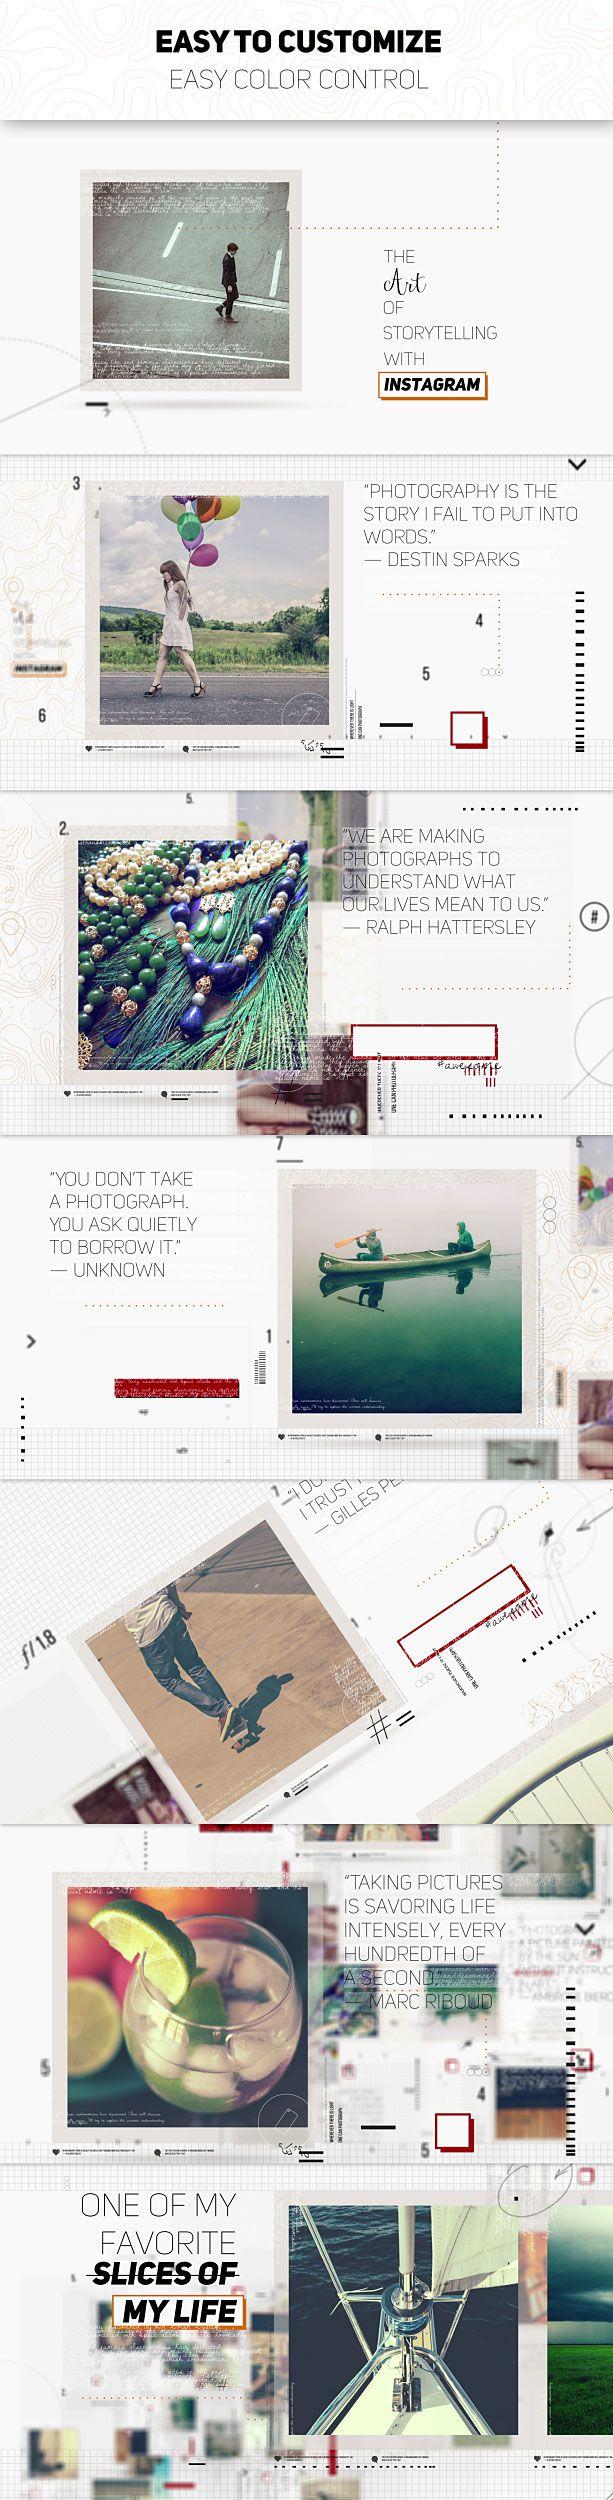 videohive The Art of Storytelling پروژه افترافکت نمونه کار نقل قول عکس هنری